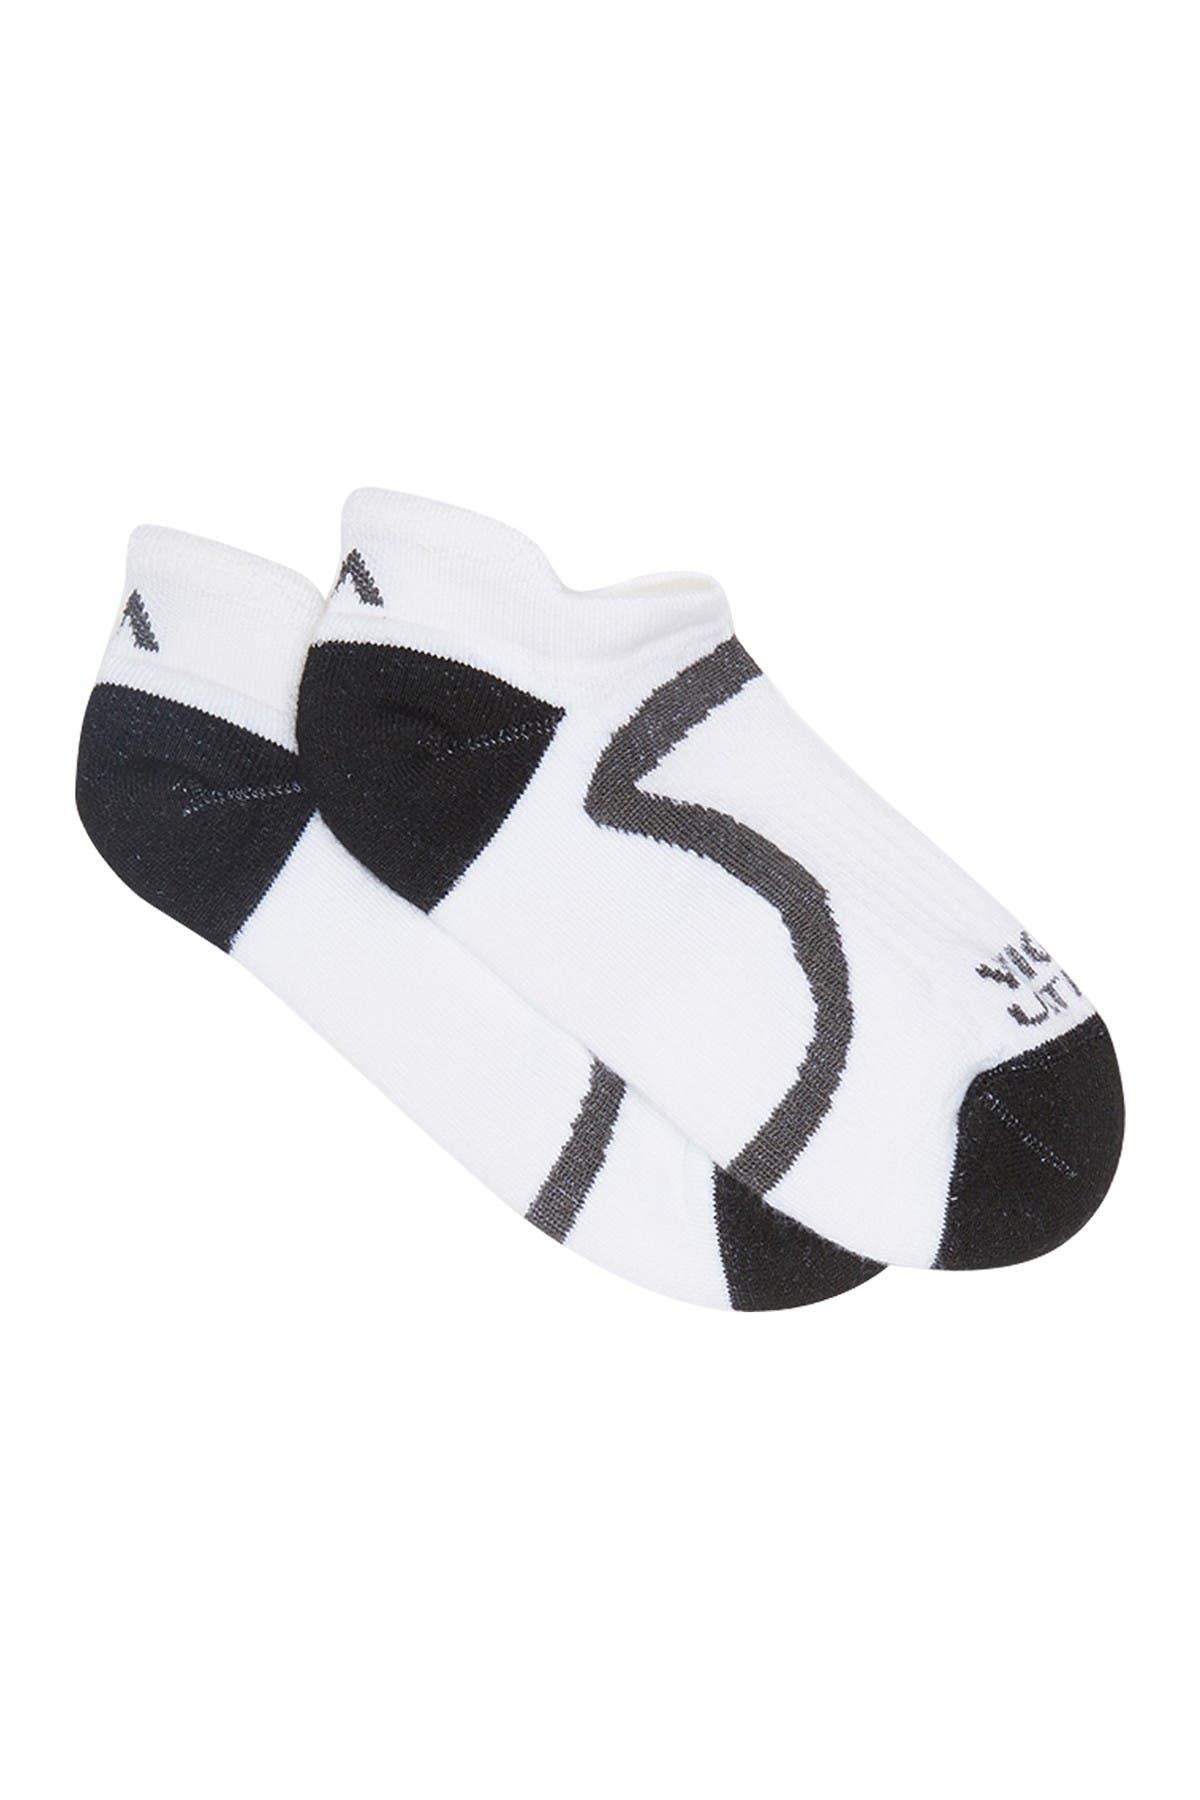 Image of WIGWAM Verve Pro Low Socks